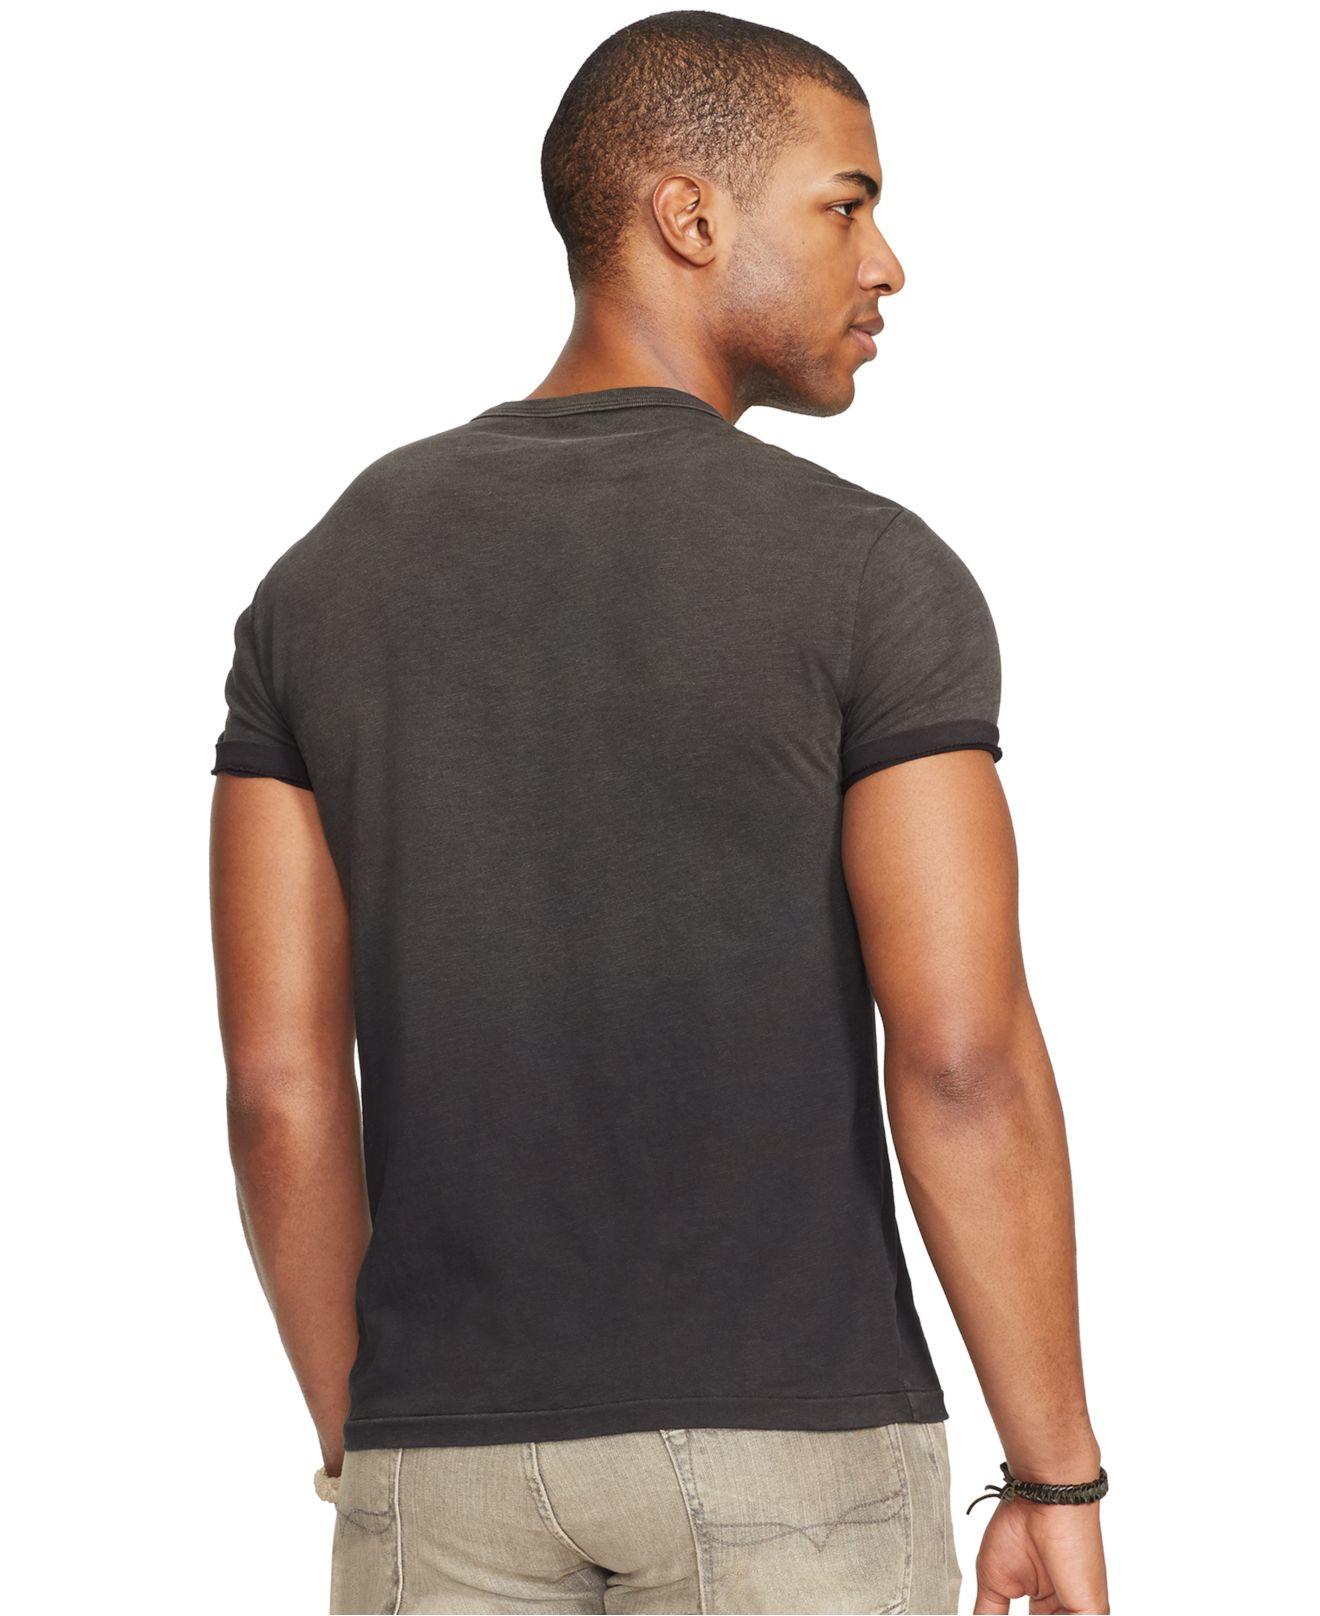 polo ralph lauren jersey logo t shirt in black for men lyst. Black Bedroom Furniture Sets. Home Design Ideas